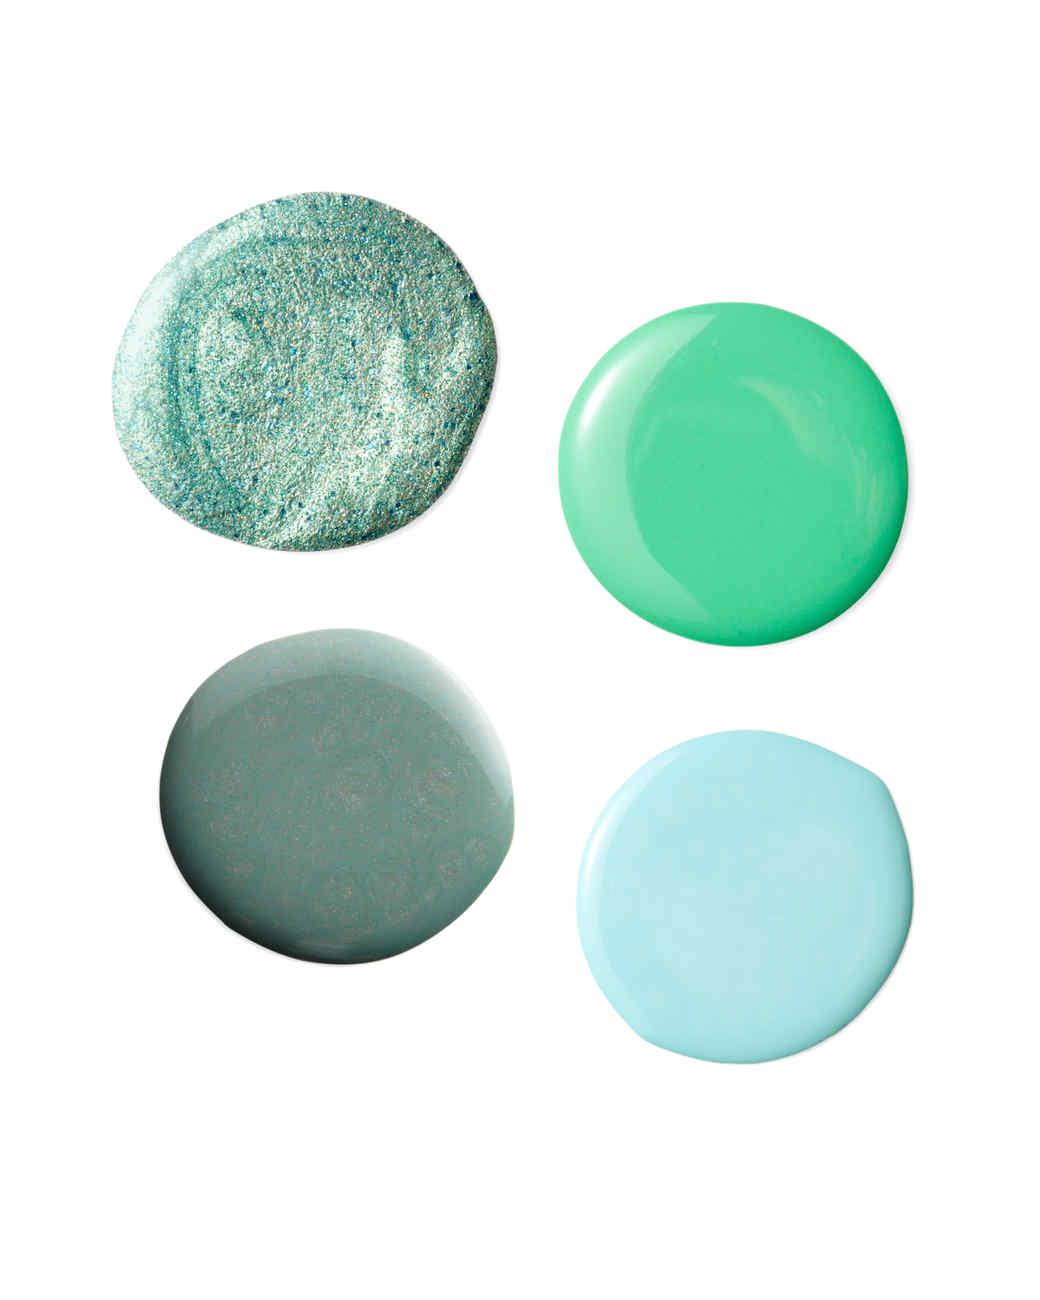 nail-polish-midgreens-msl0612.jpg